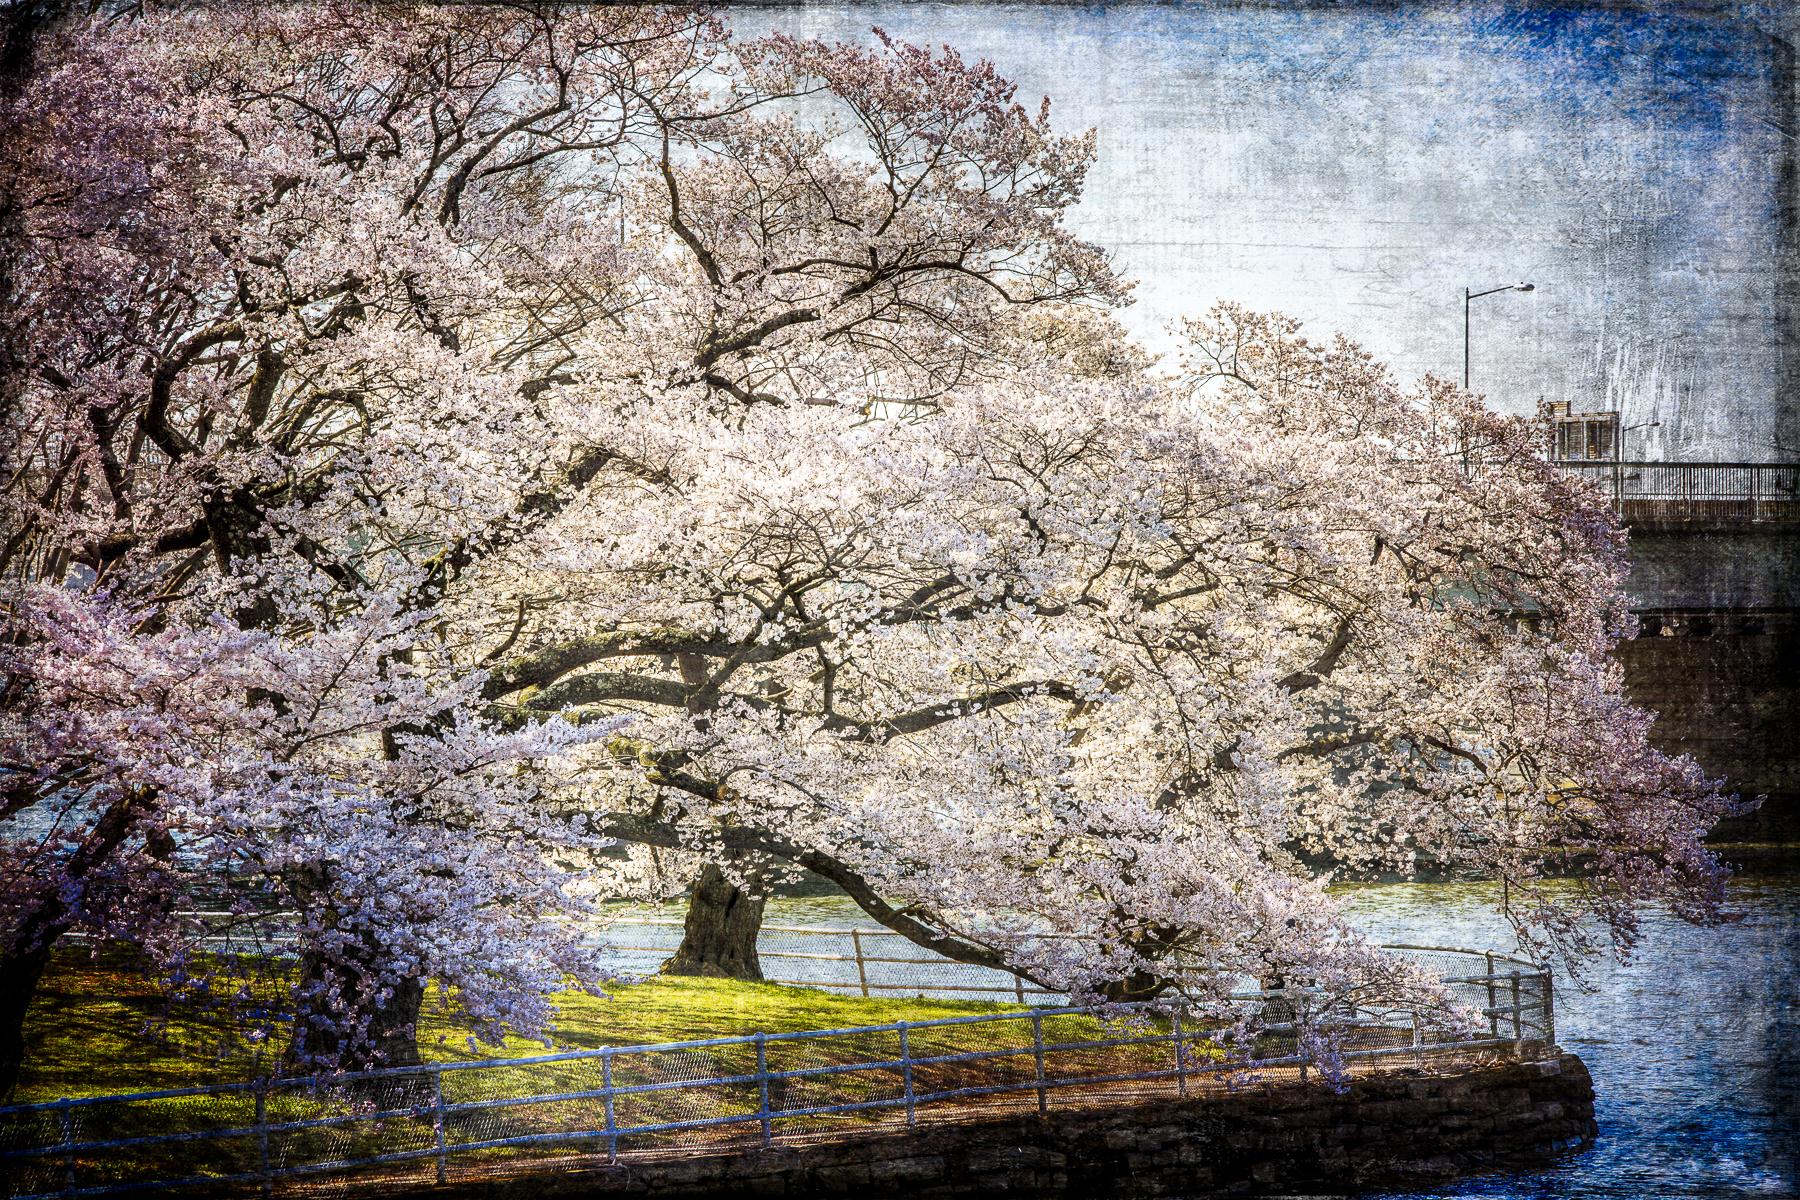 Sandy_Adams_Cherry_Blossom_Season_Hope-3.jpg